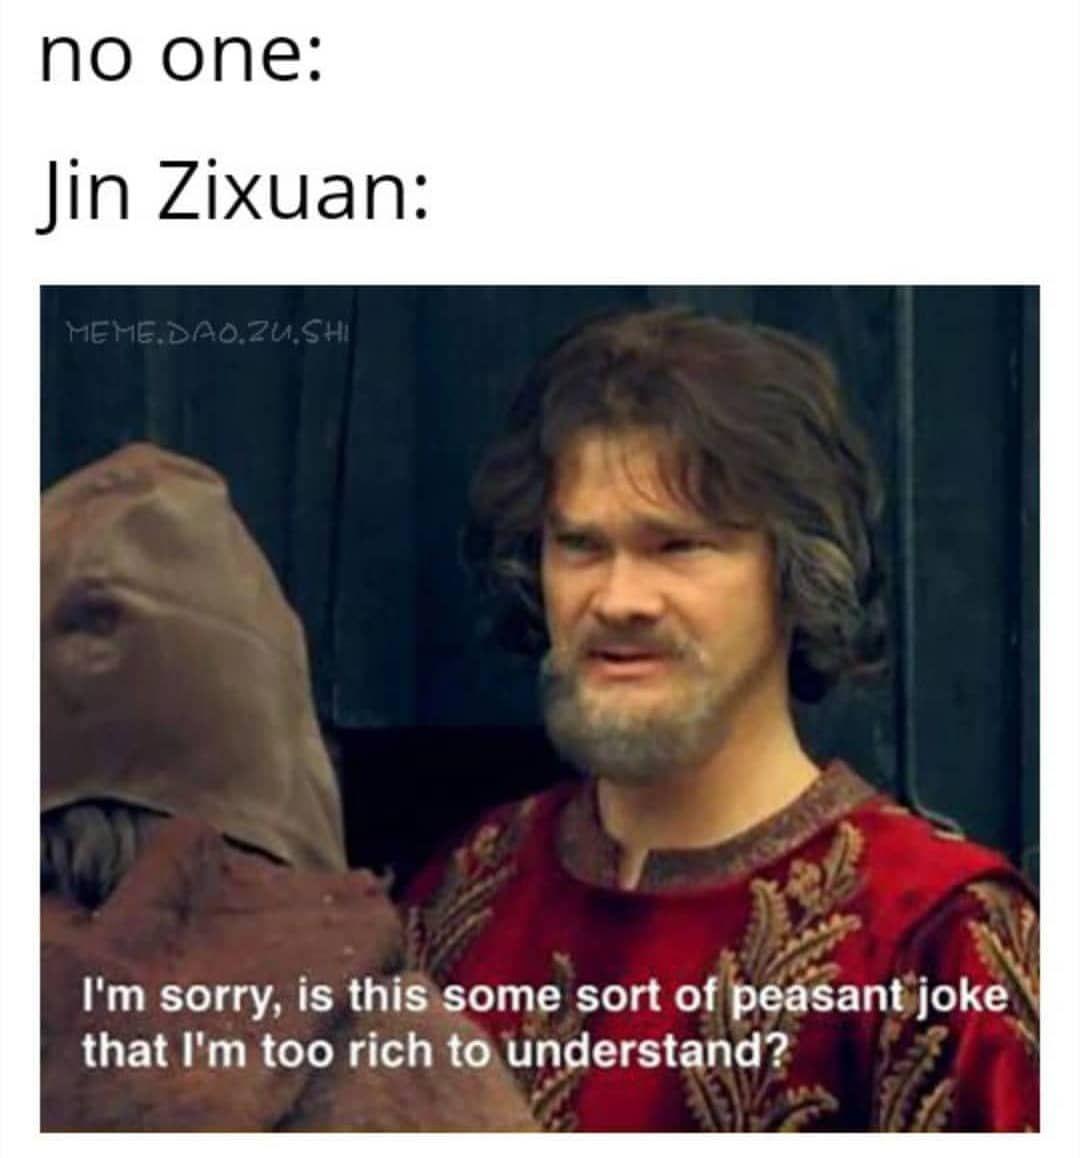 Hehehe On Instagram This Meme Template Was Made For Jin Zixuan D Tags Modaozushi Weiwuxian Theuntamed Mdzs Lanwangji Dnd Funny Christian Memes Jokes